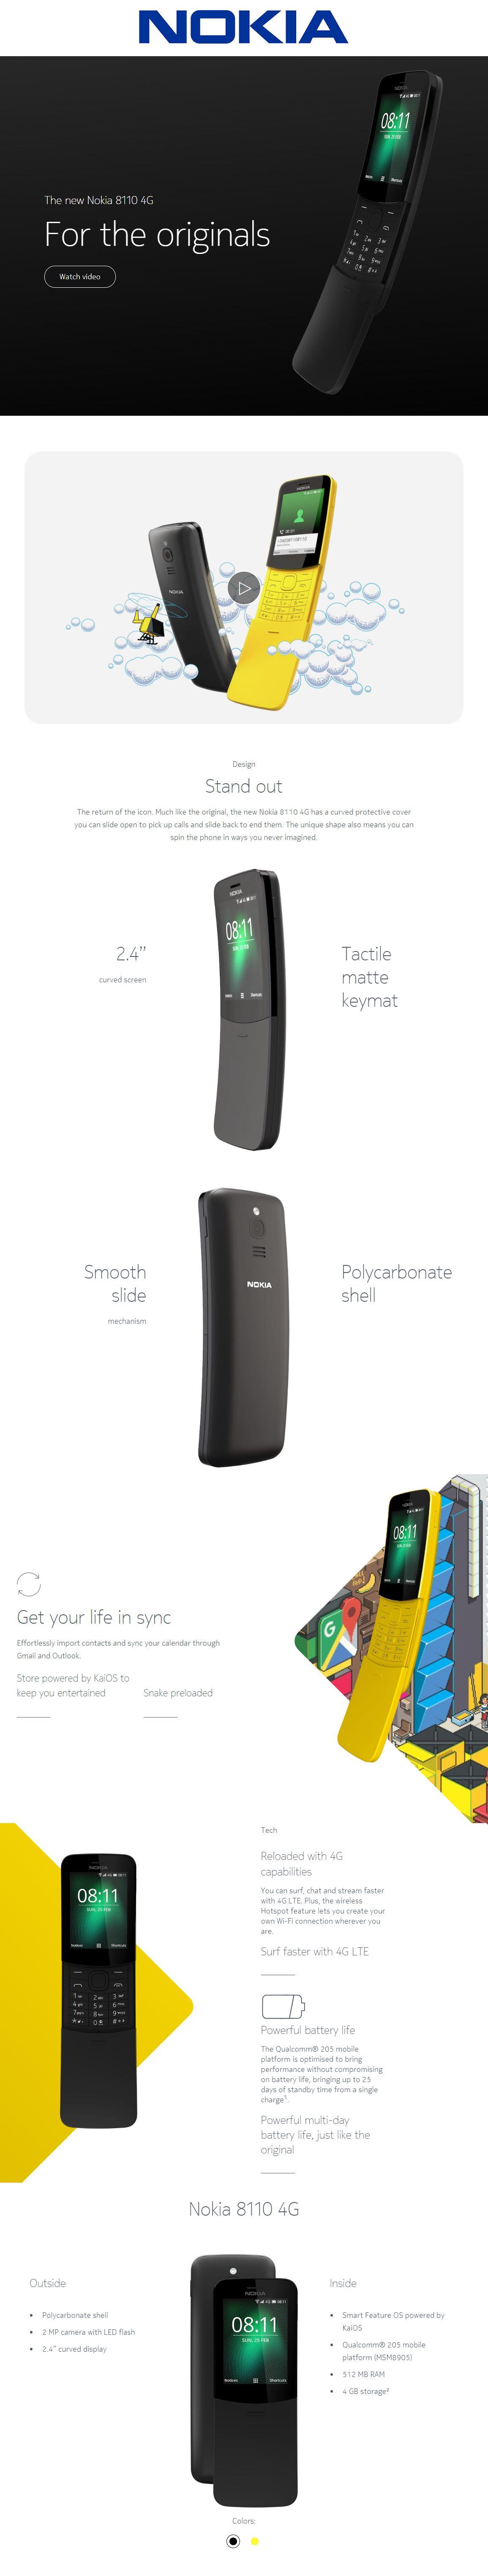 Nokia 8110 Specs 1.jpg